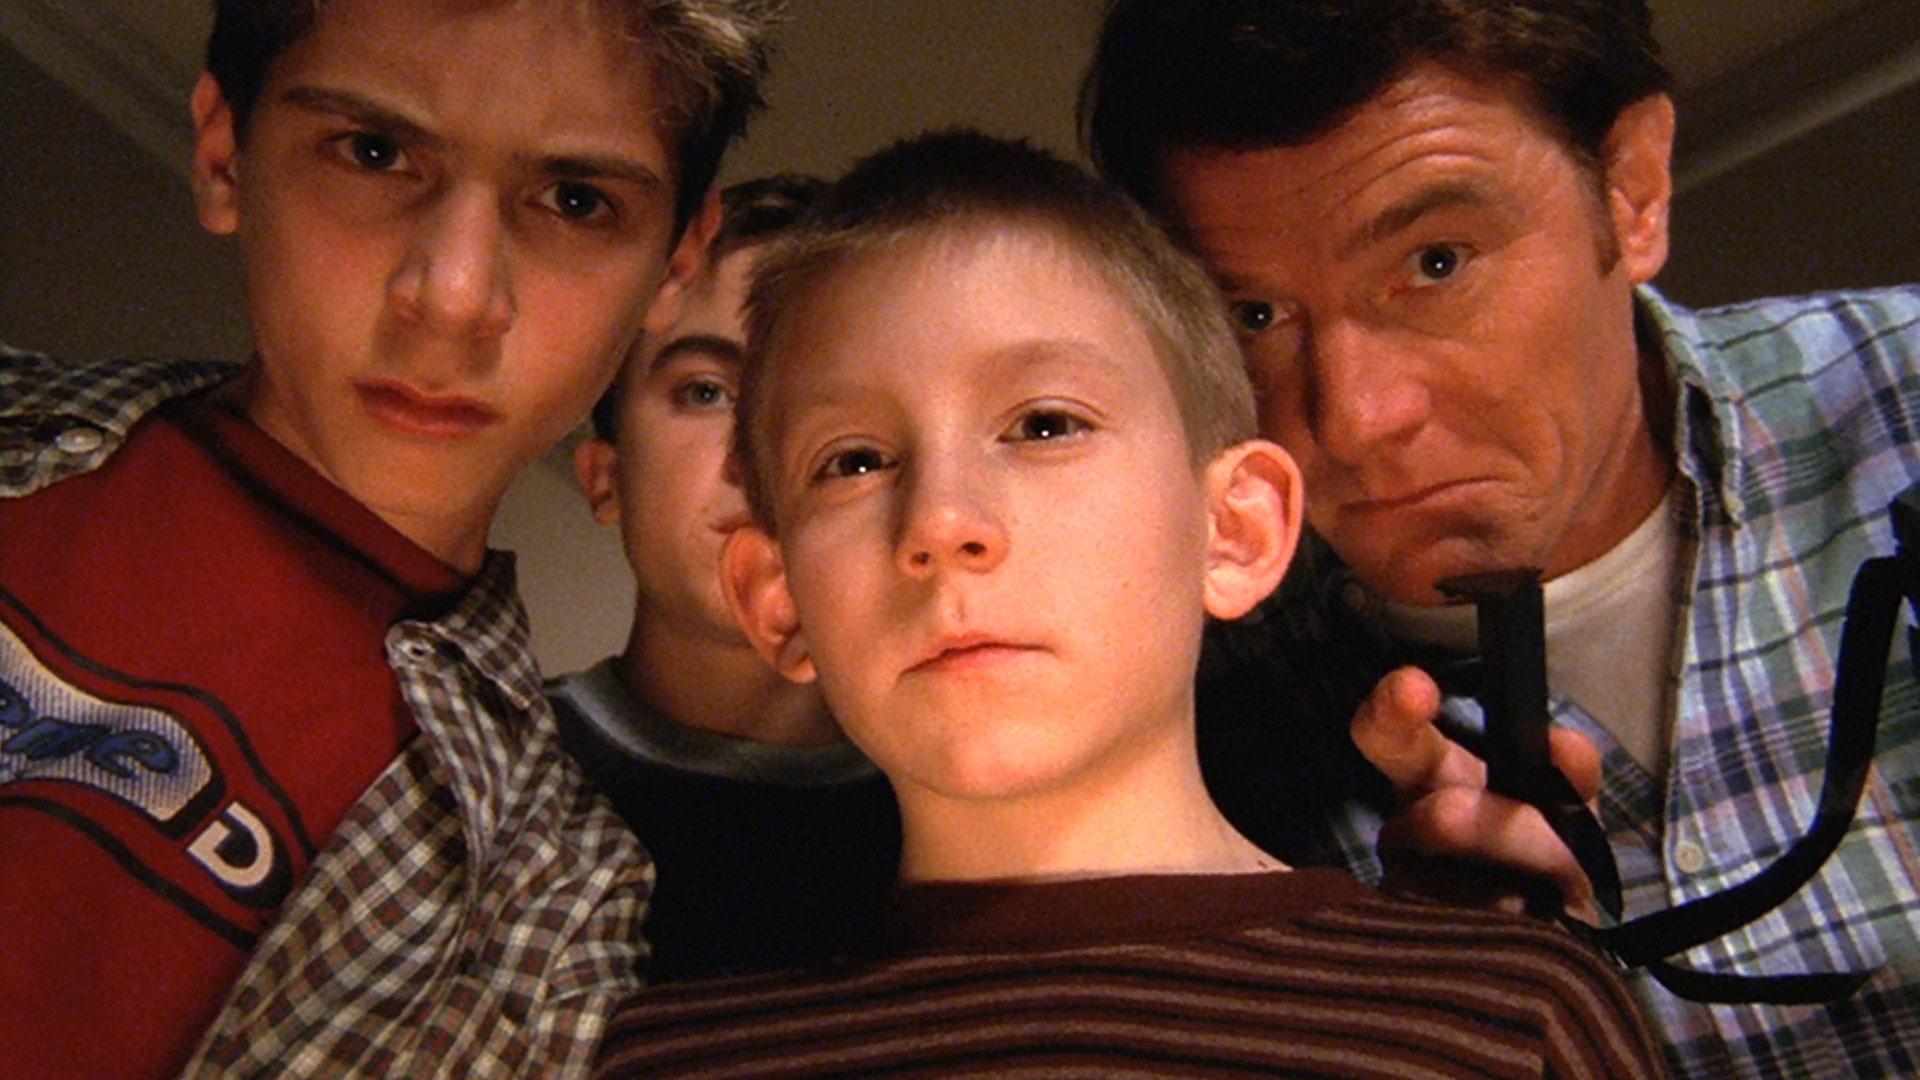 Justin Berfield (Reese), Frankie Muniz (Malcolm), Erik Per Sullivan (Dewey) et Bryan Cranston (Hal) et dans